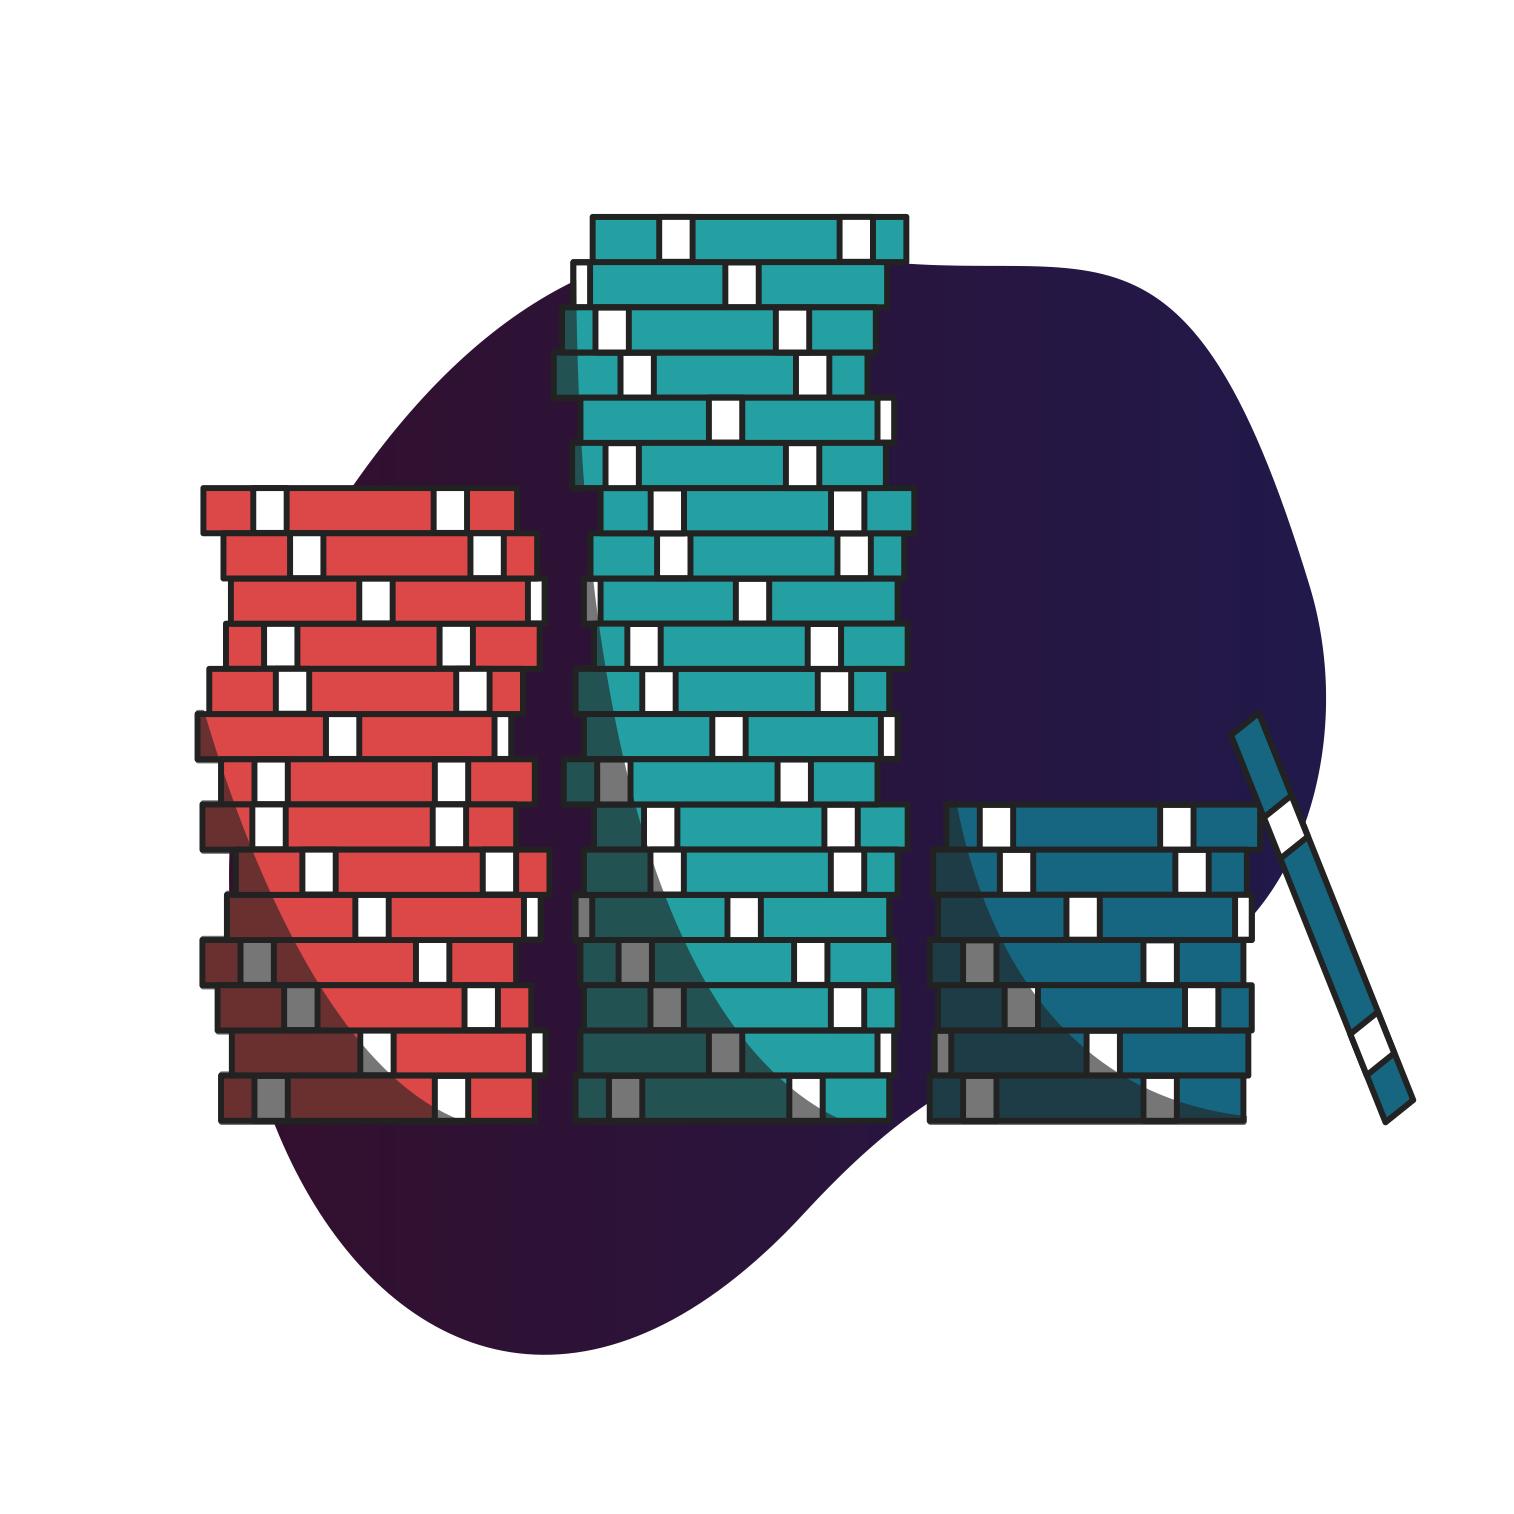 Casino chips graphic